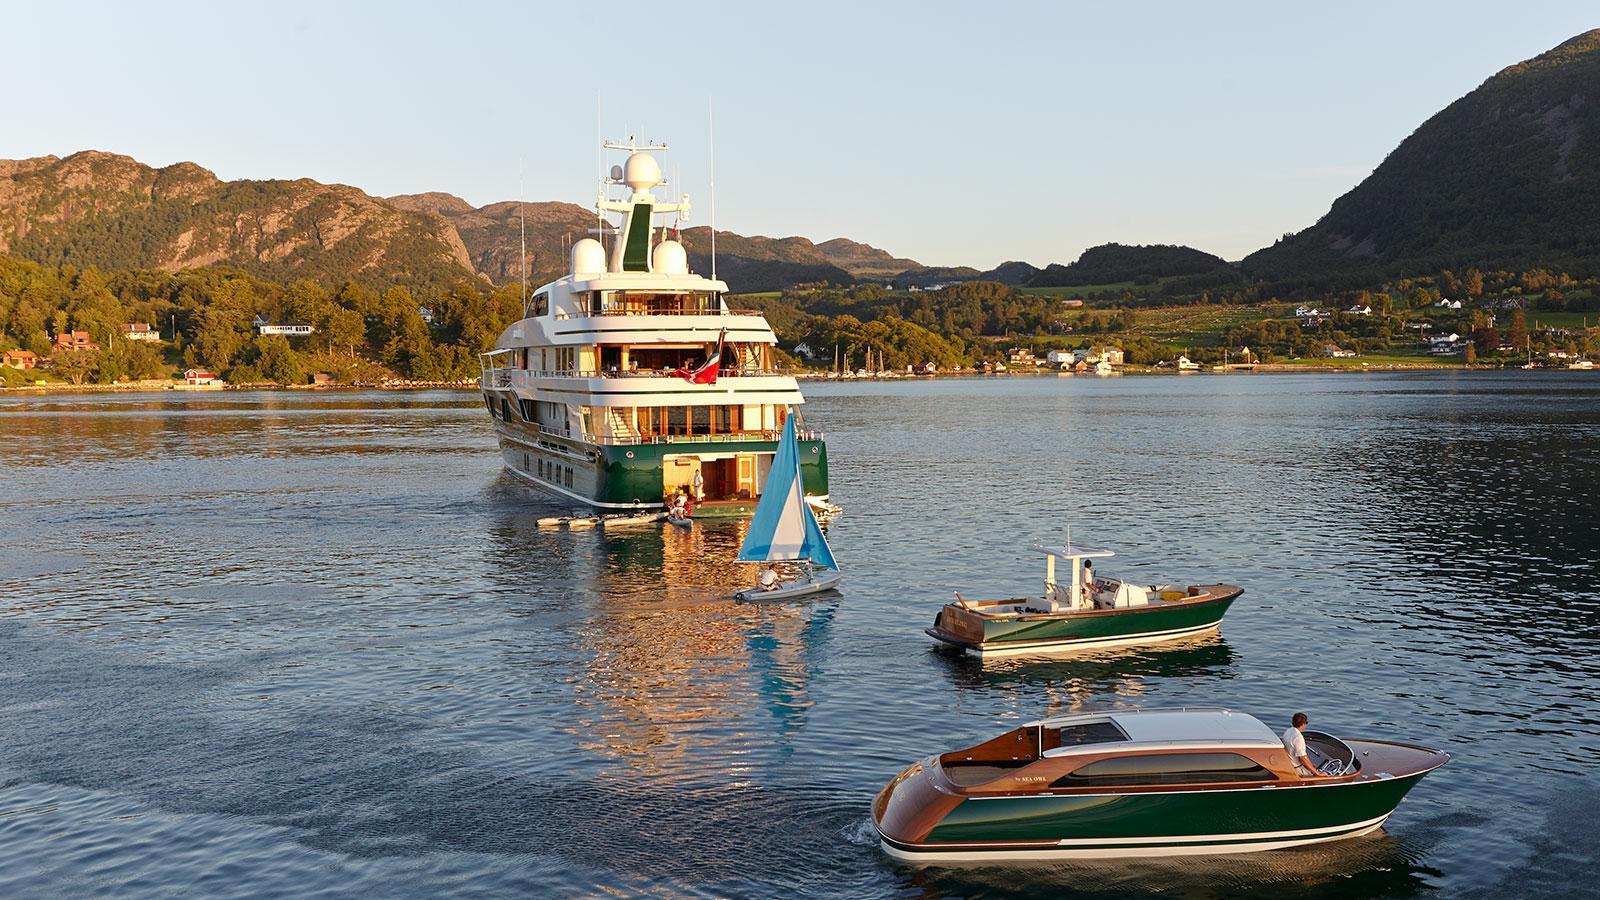 sea-owl-motor-yacht-feadship-2013-62m-tenders